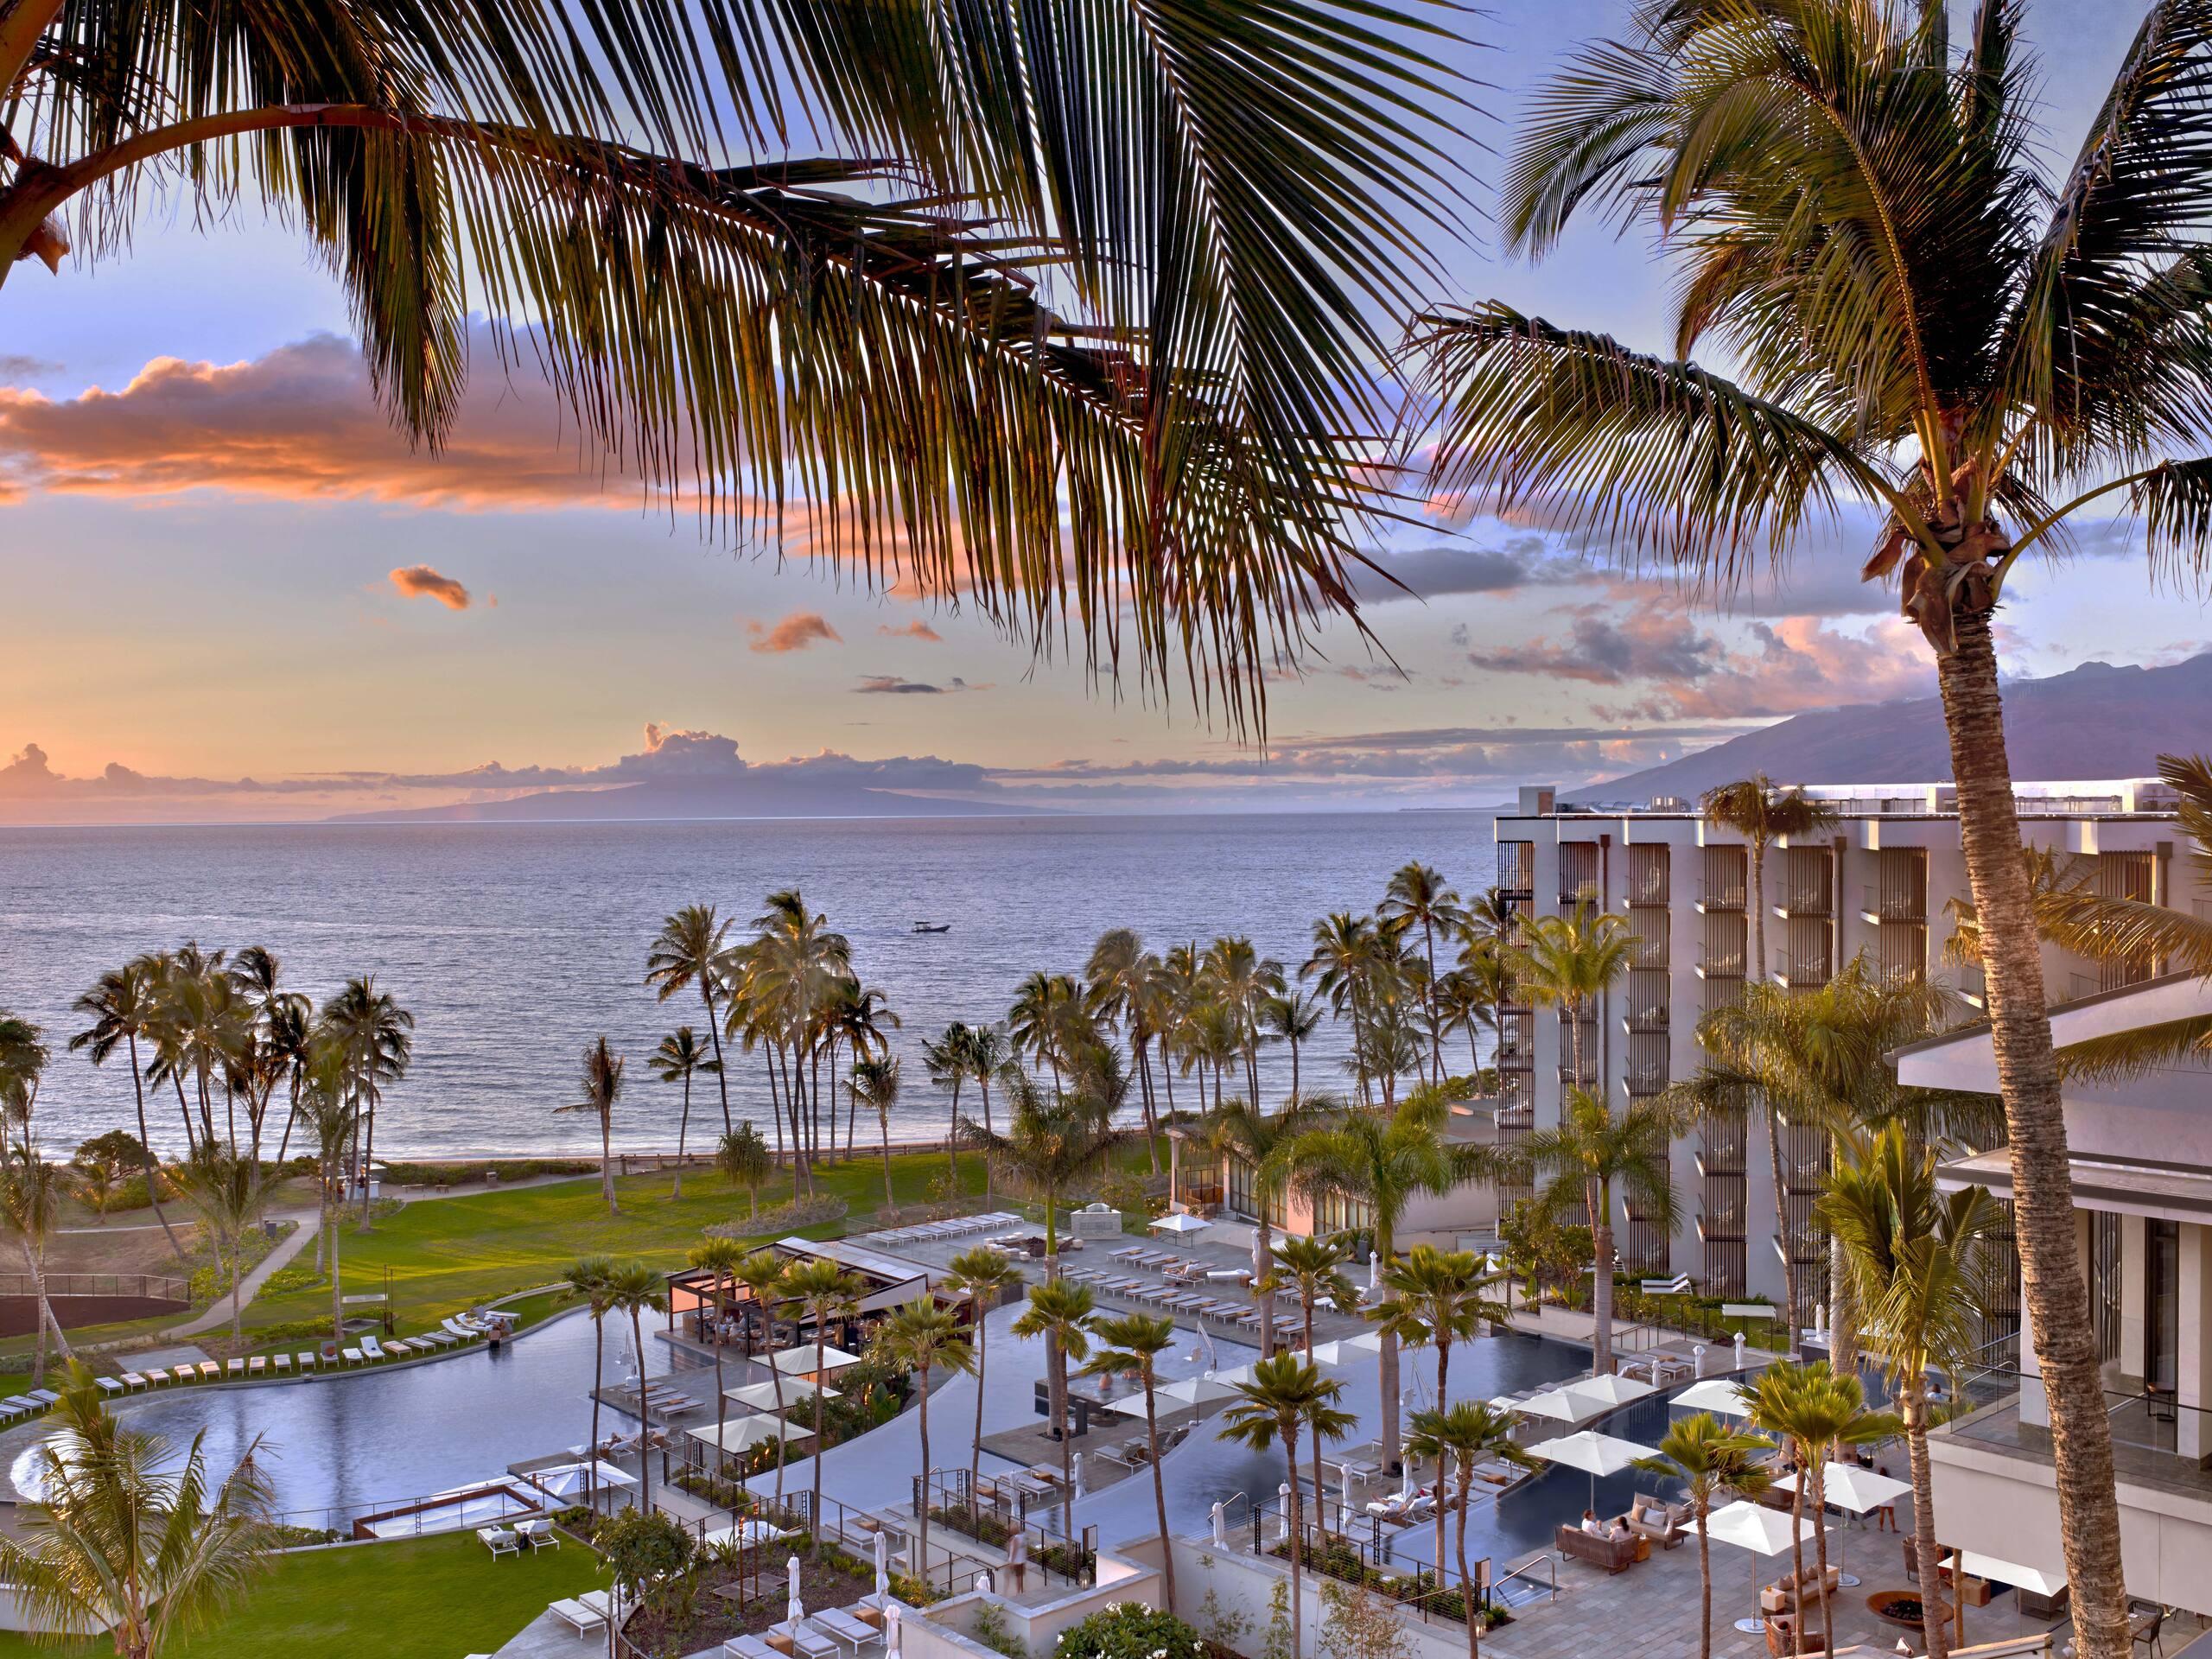 Best Maui hotels: Andaz Maui at Wailea Resort